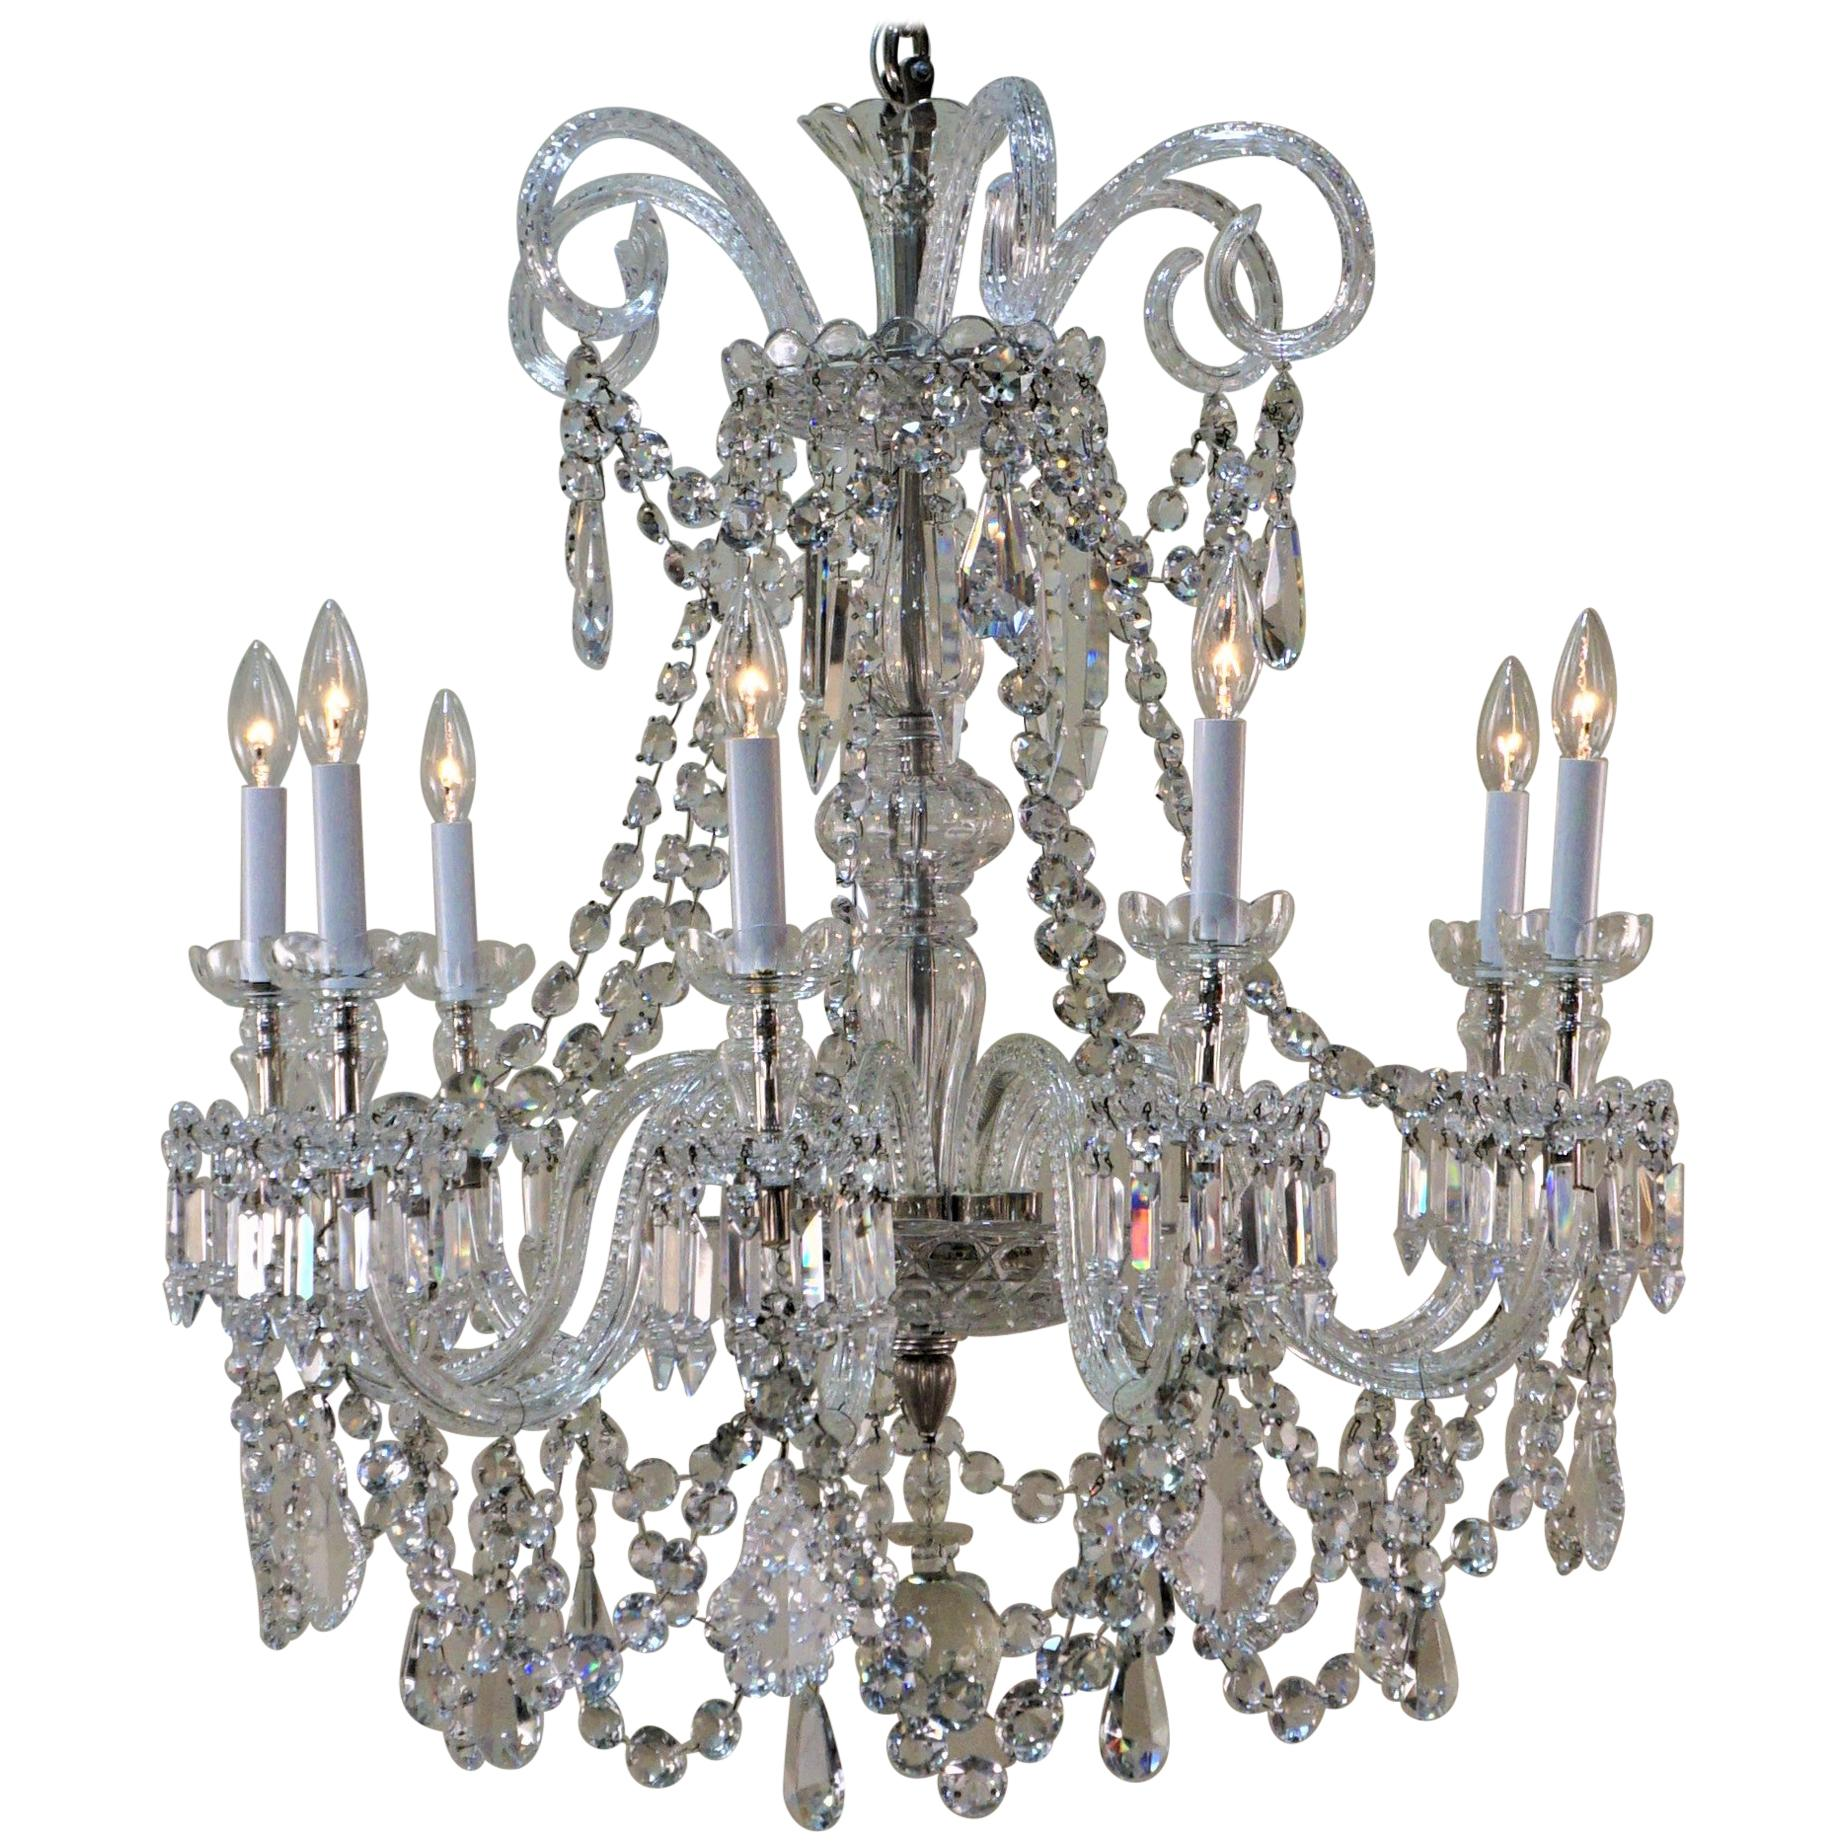 royal saint louis crystal chandeliers